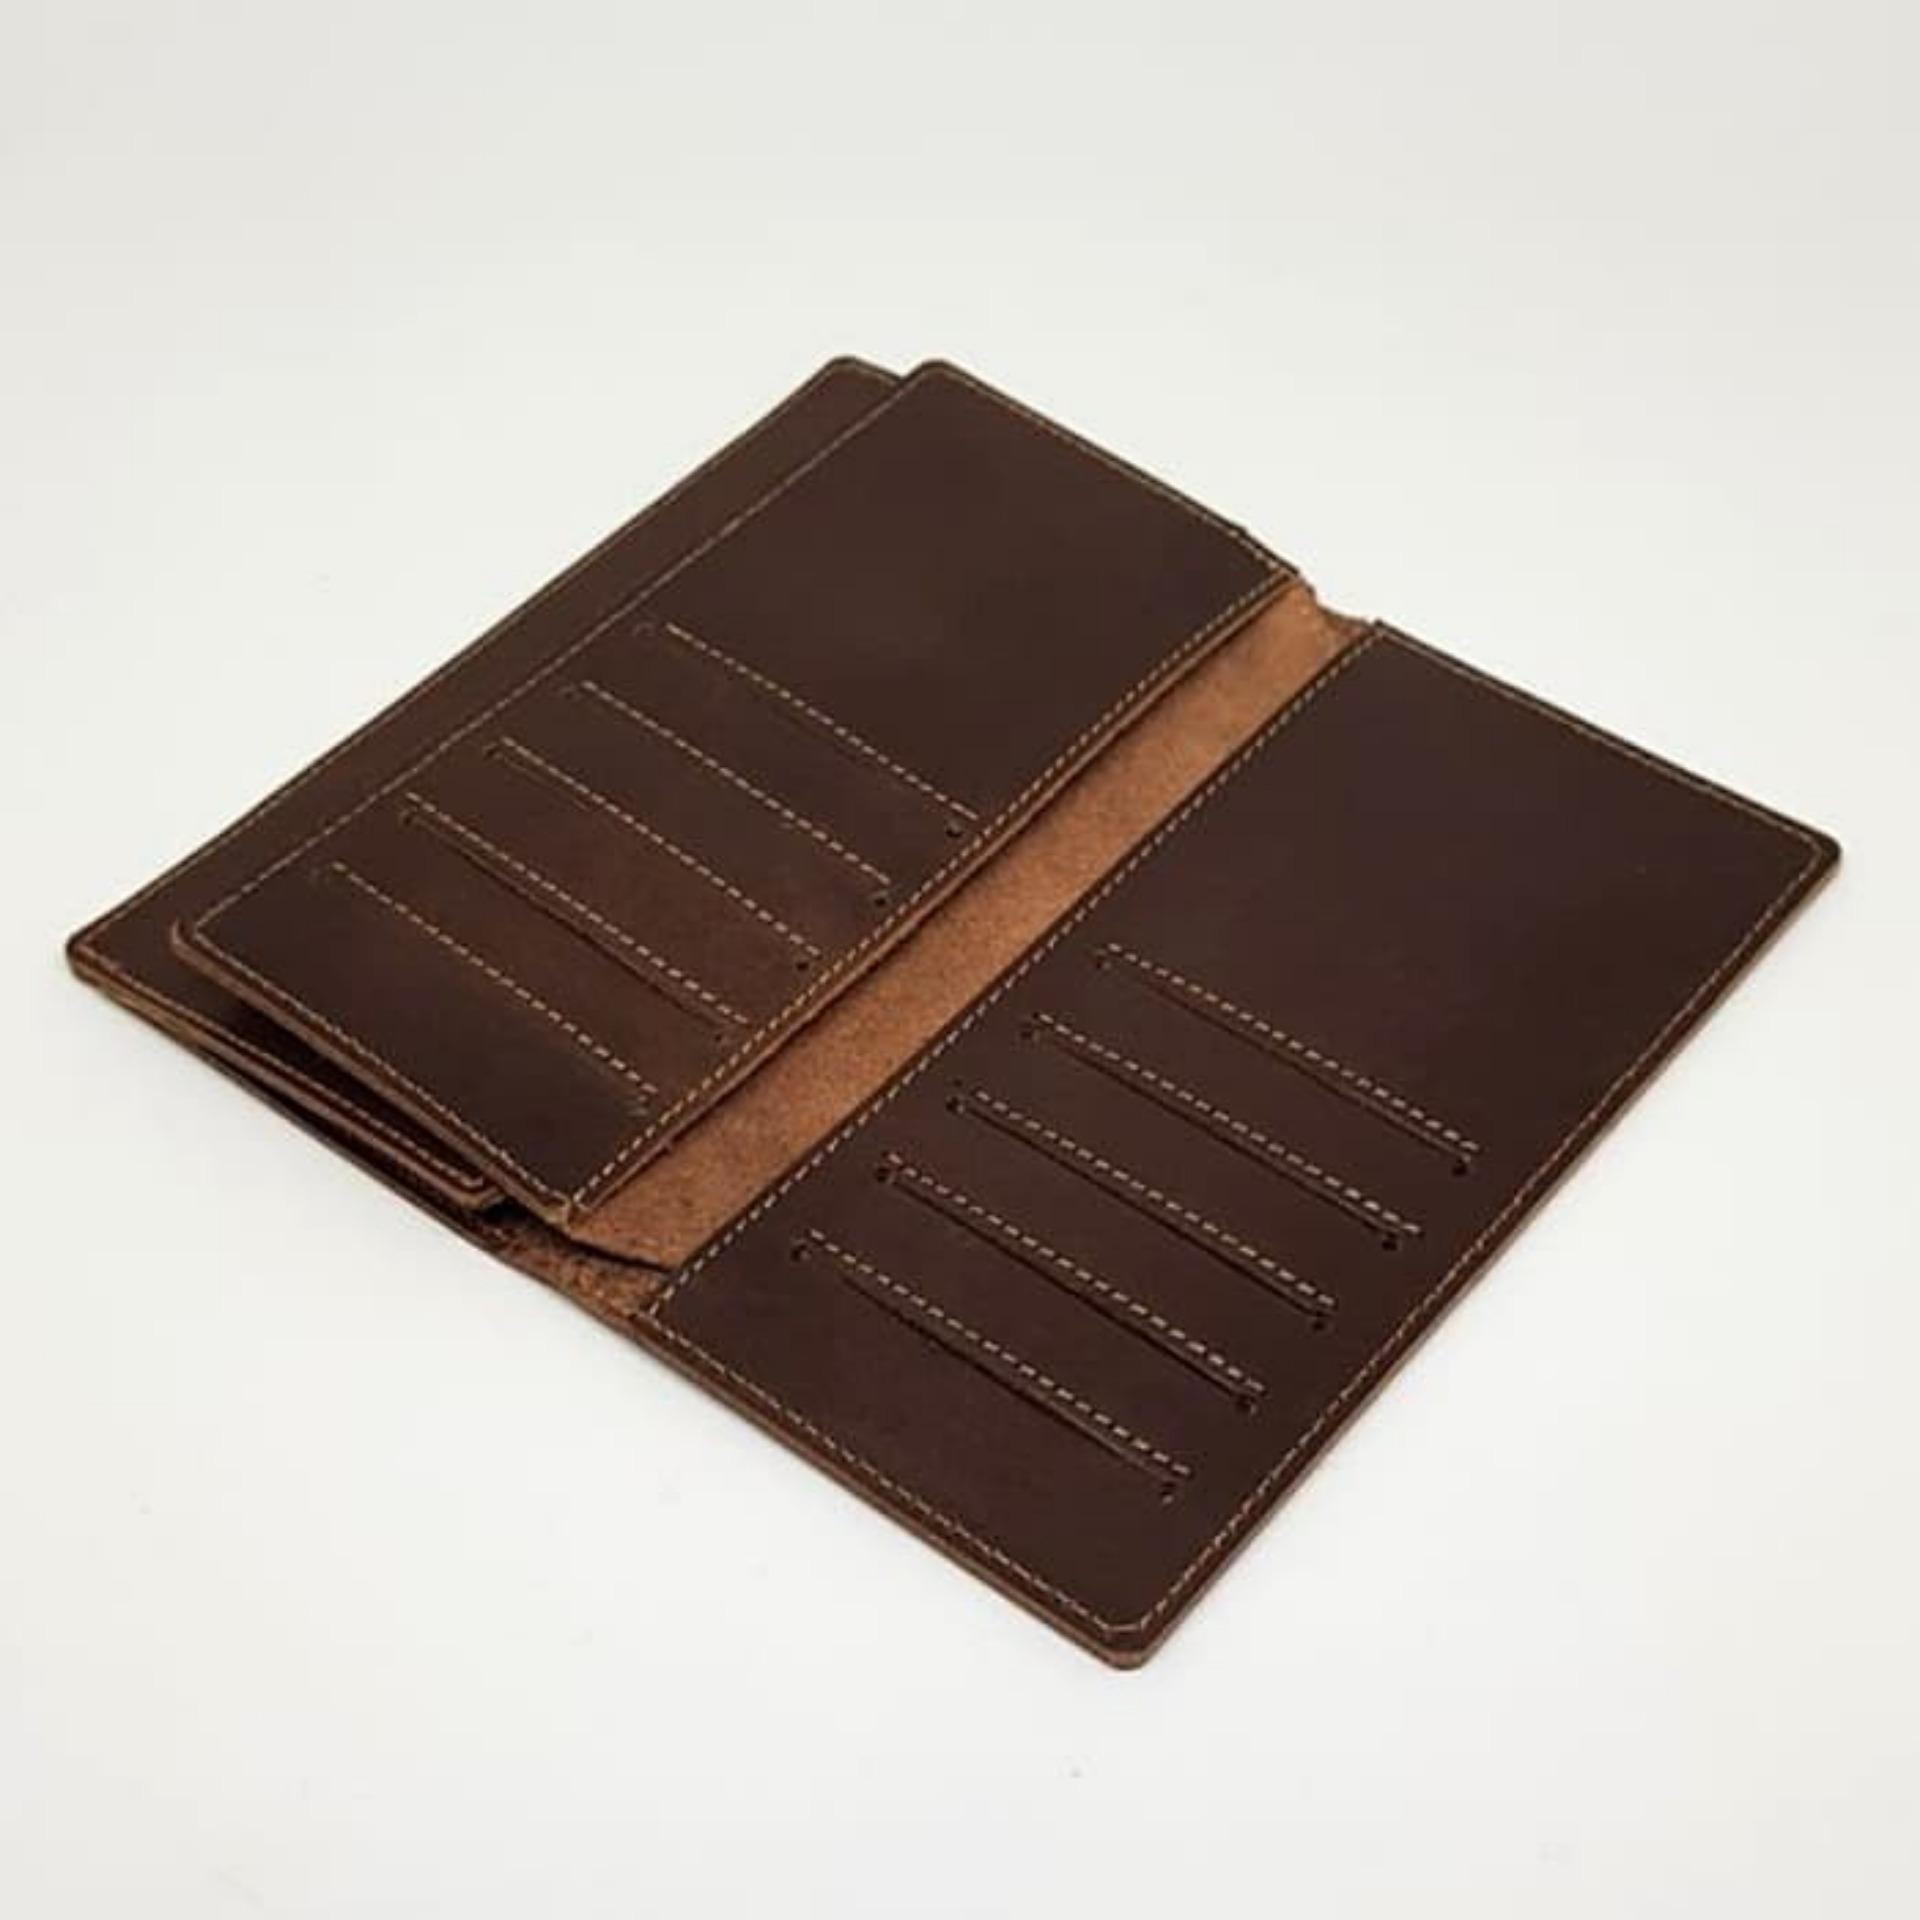 Dompet Pria 100% Kulit Sapi Asli Model Panjang - Brown - 2